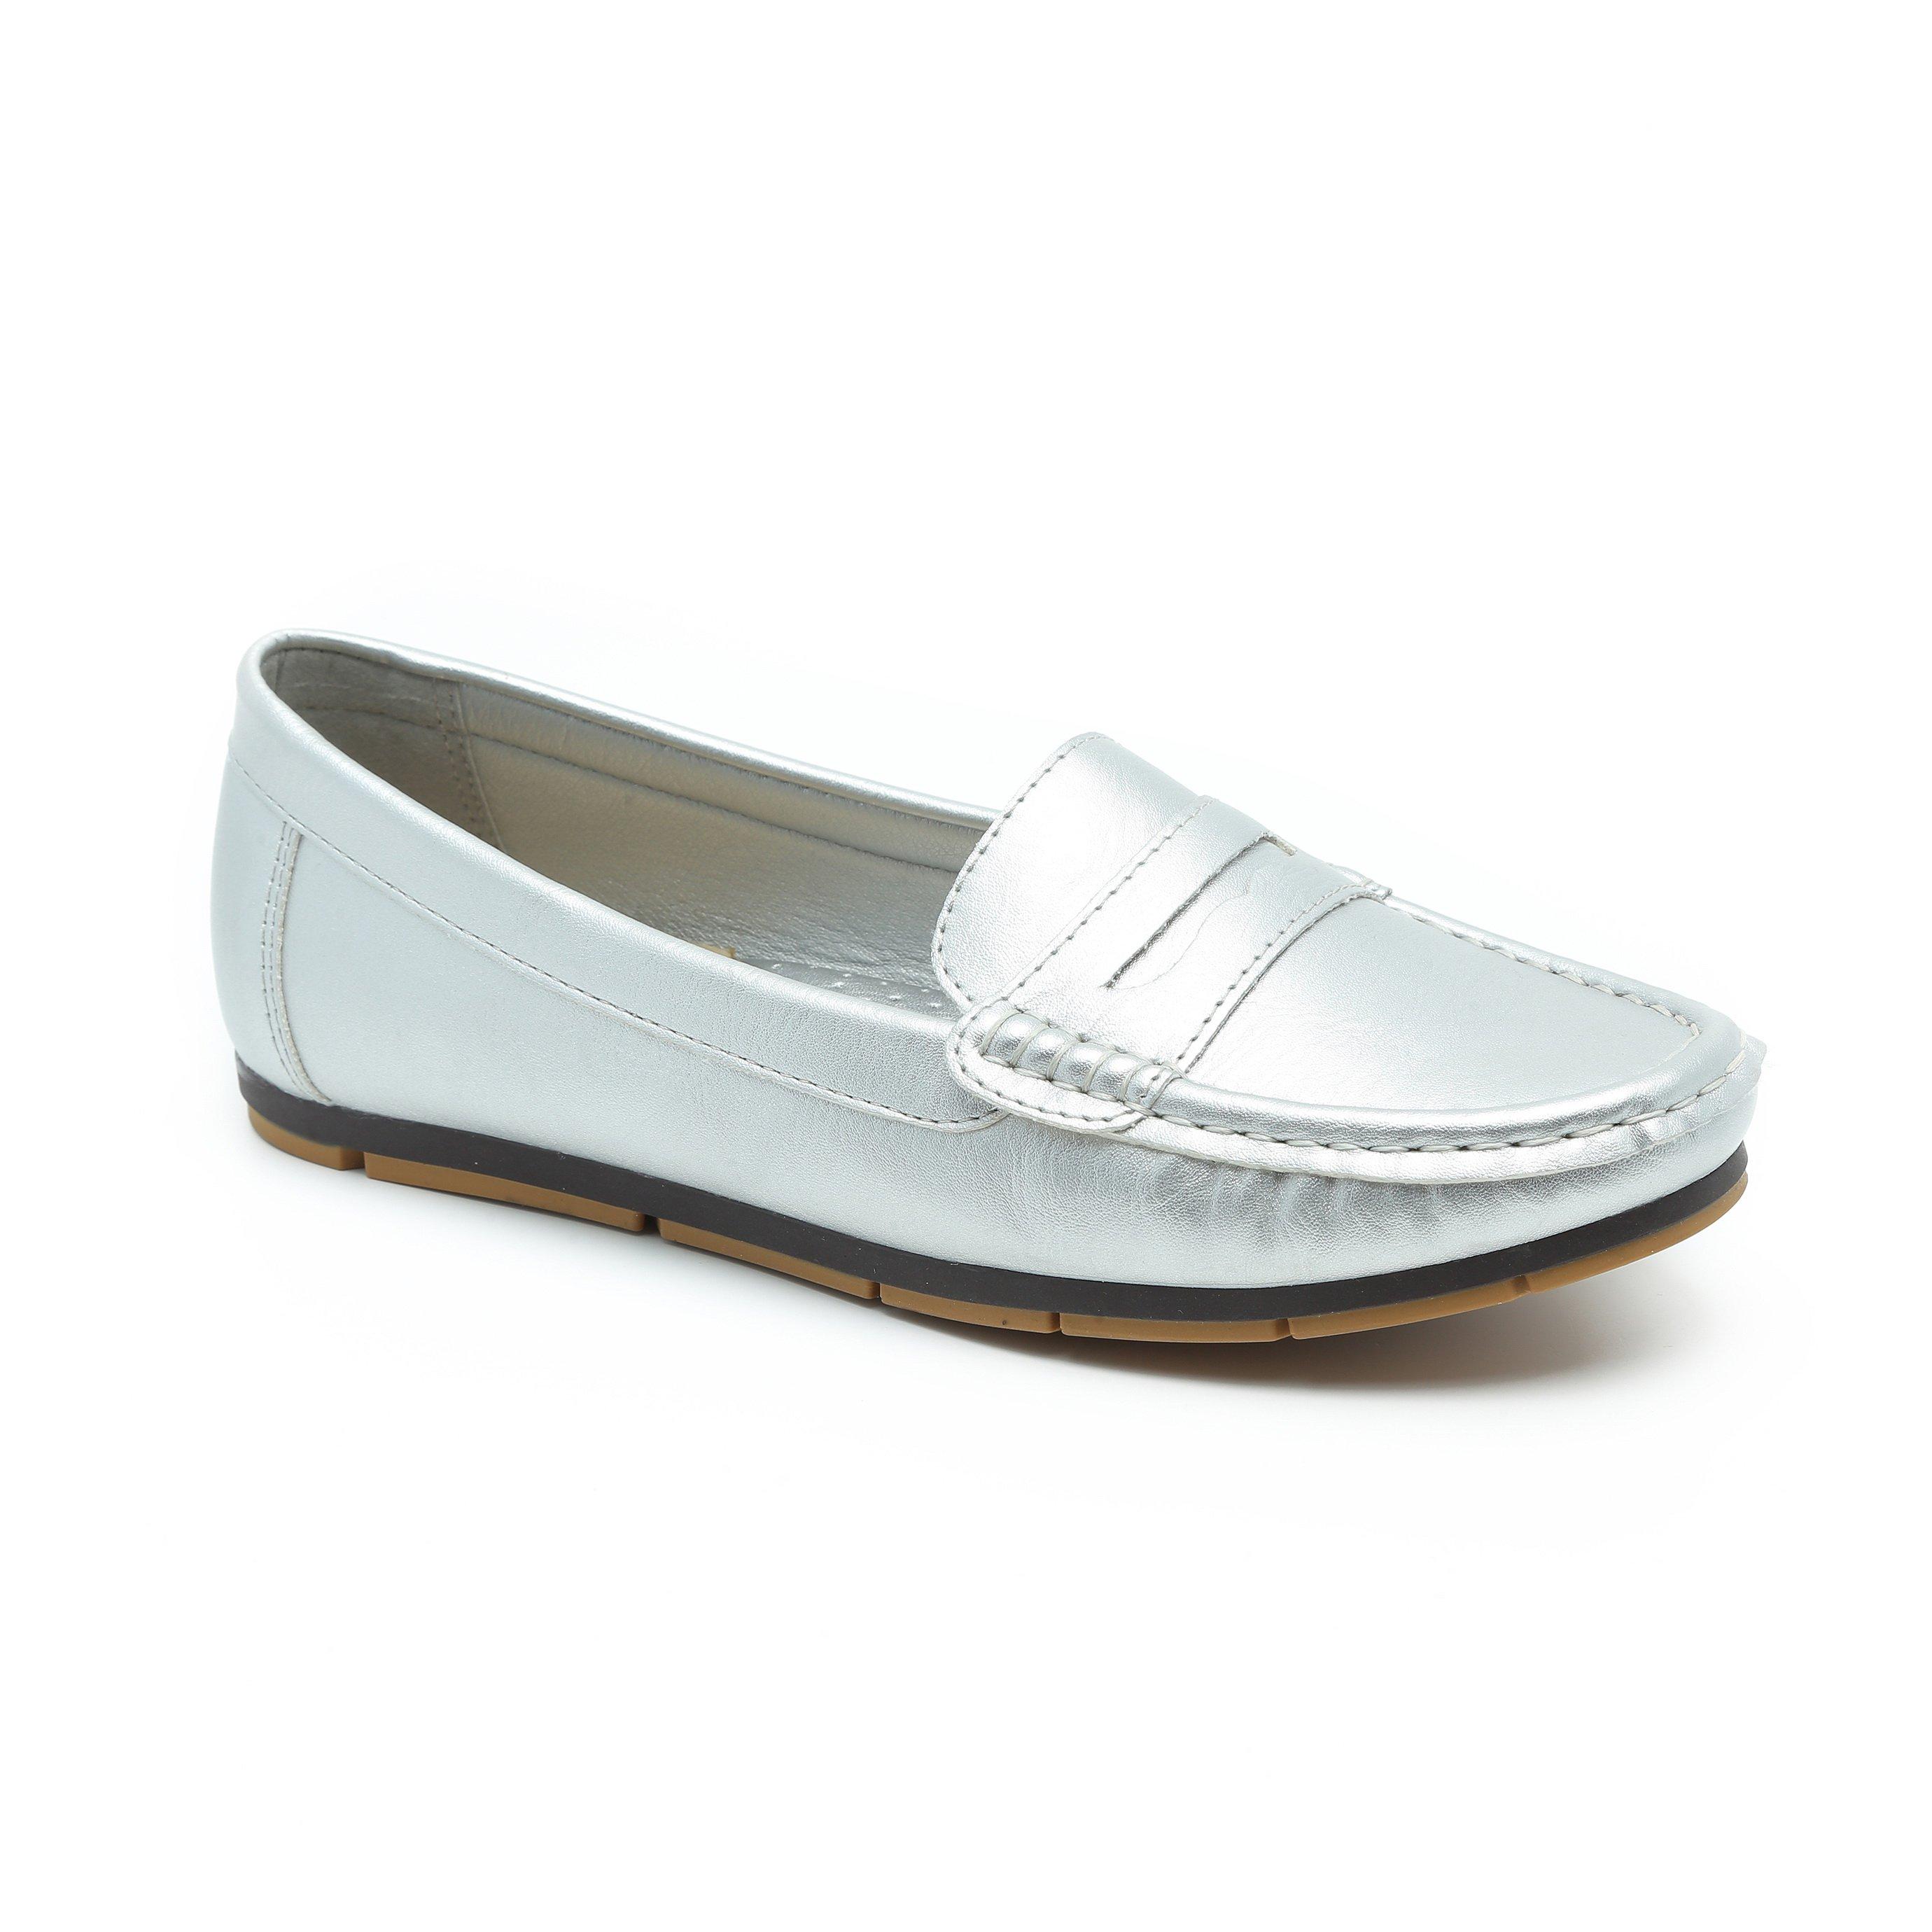 Seventy Nine - נעלי מוקסין במראה רטרו בצבע אפור בהיר